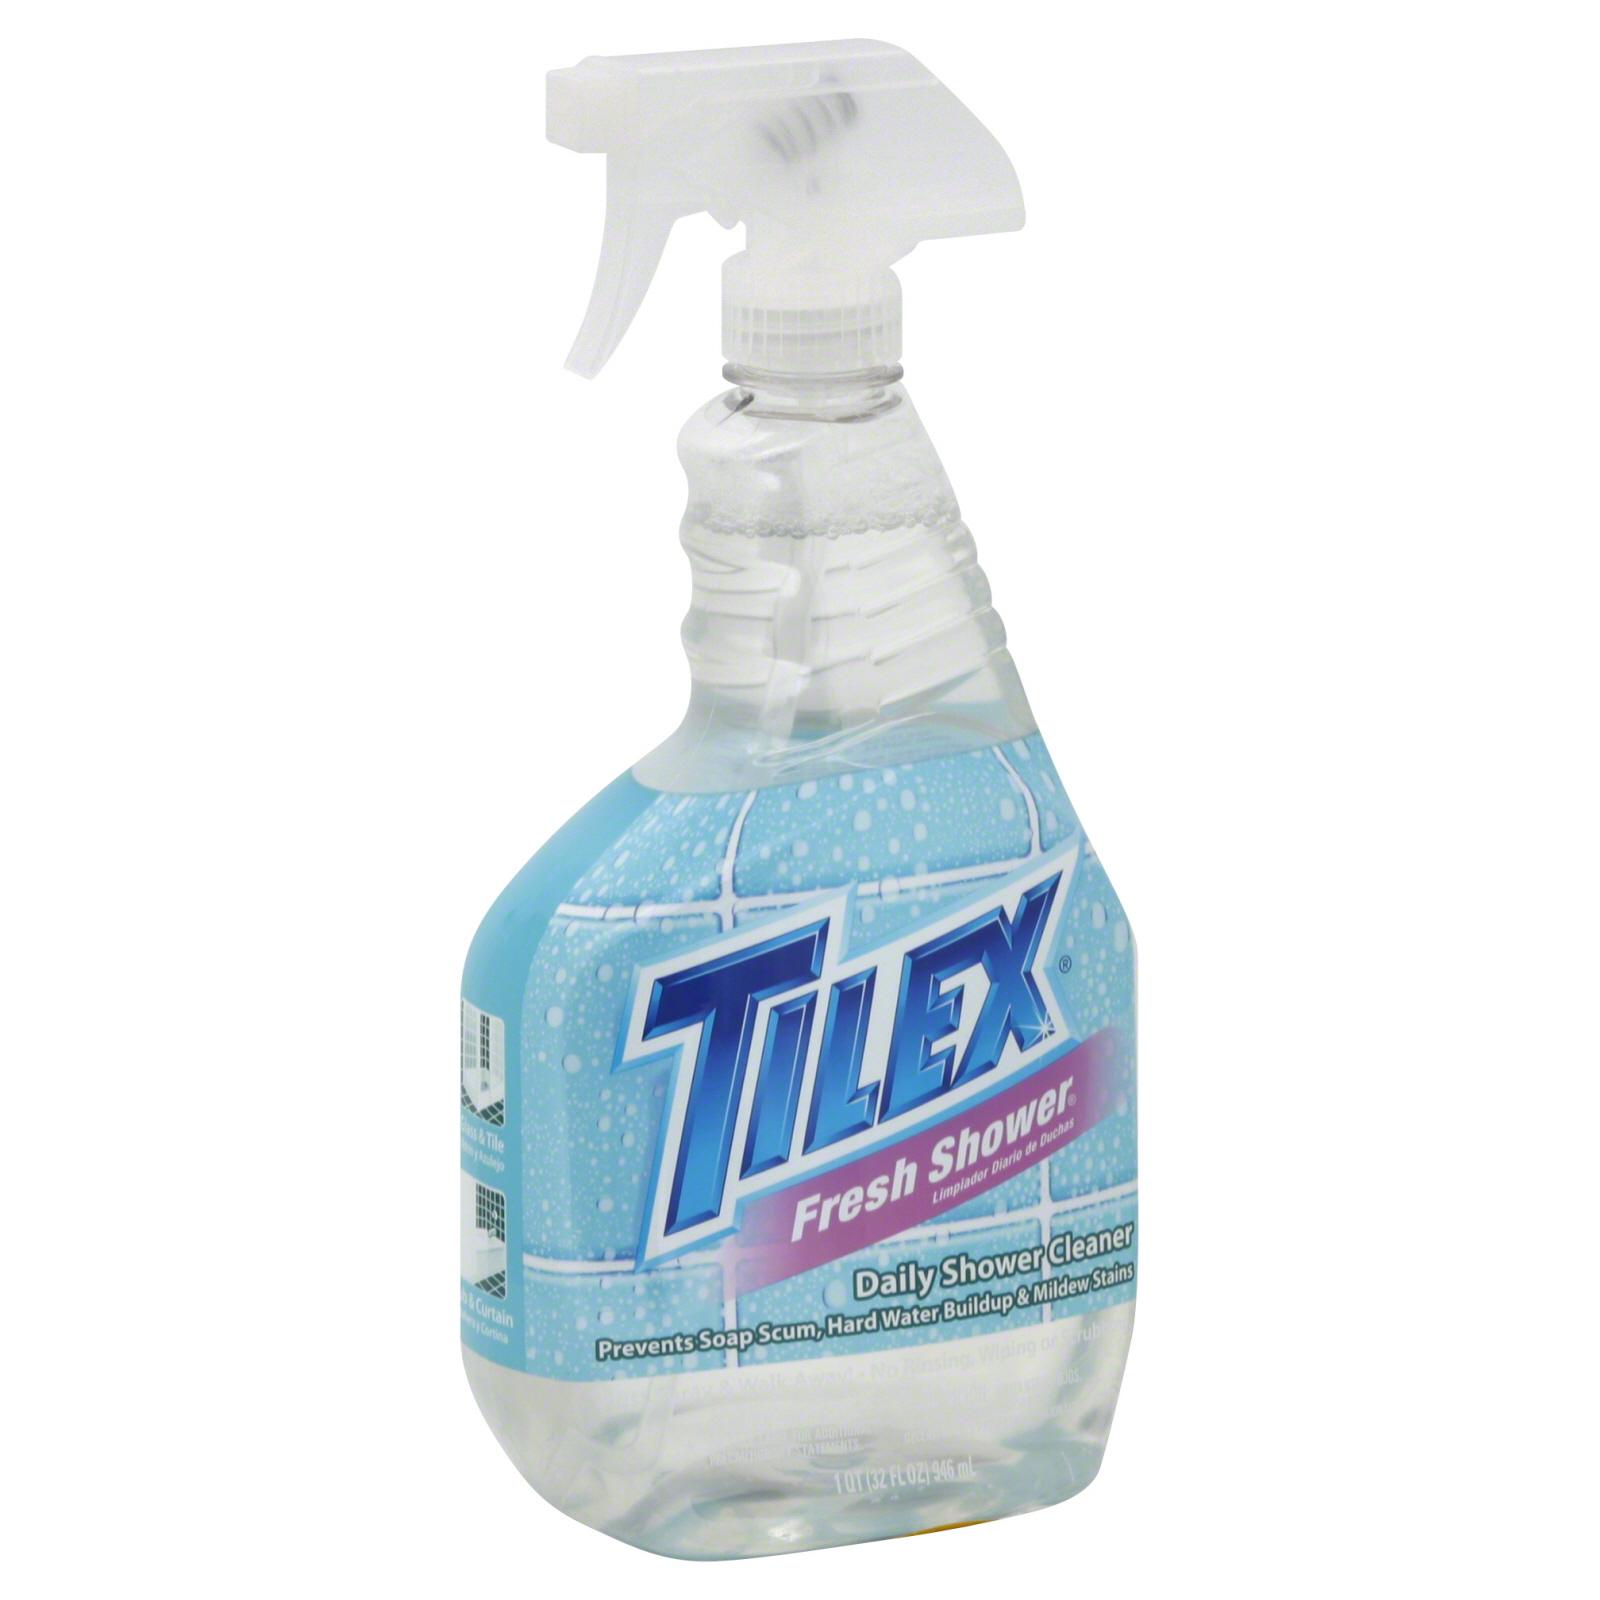 Tilex Daily Shower Cleaner, Fresh Shower, 32 Fl Oz (1 Qt) 946 Ml